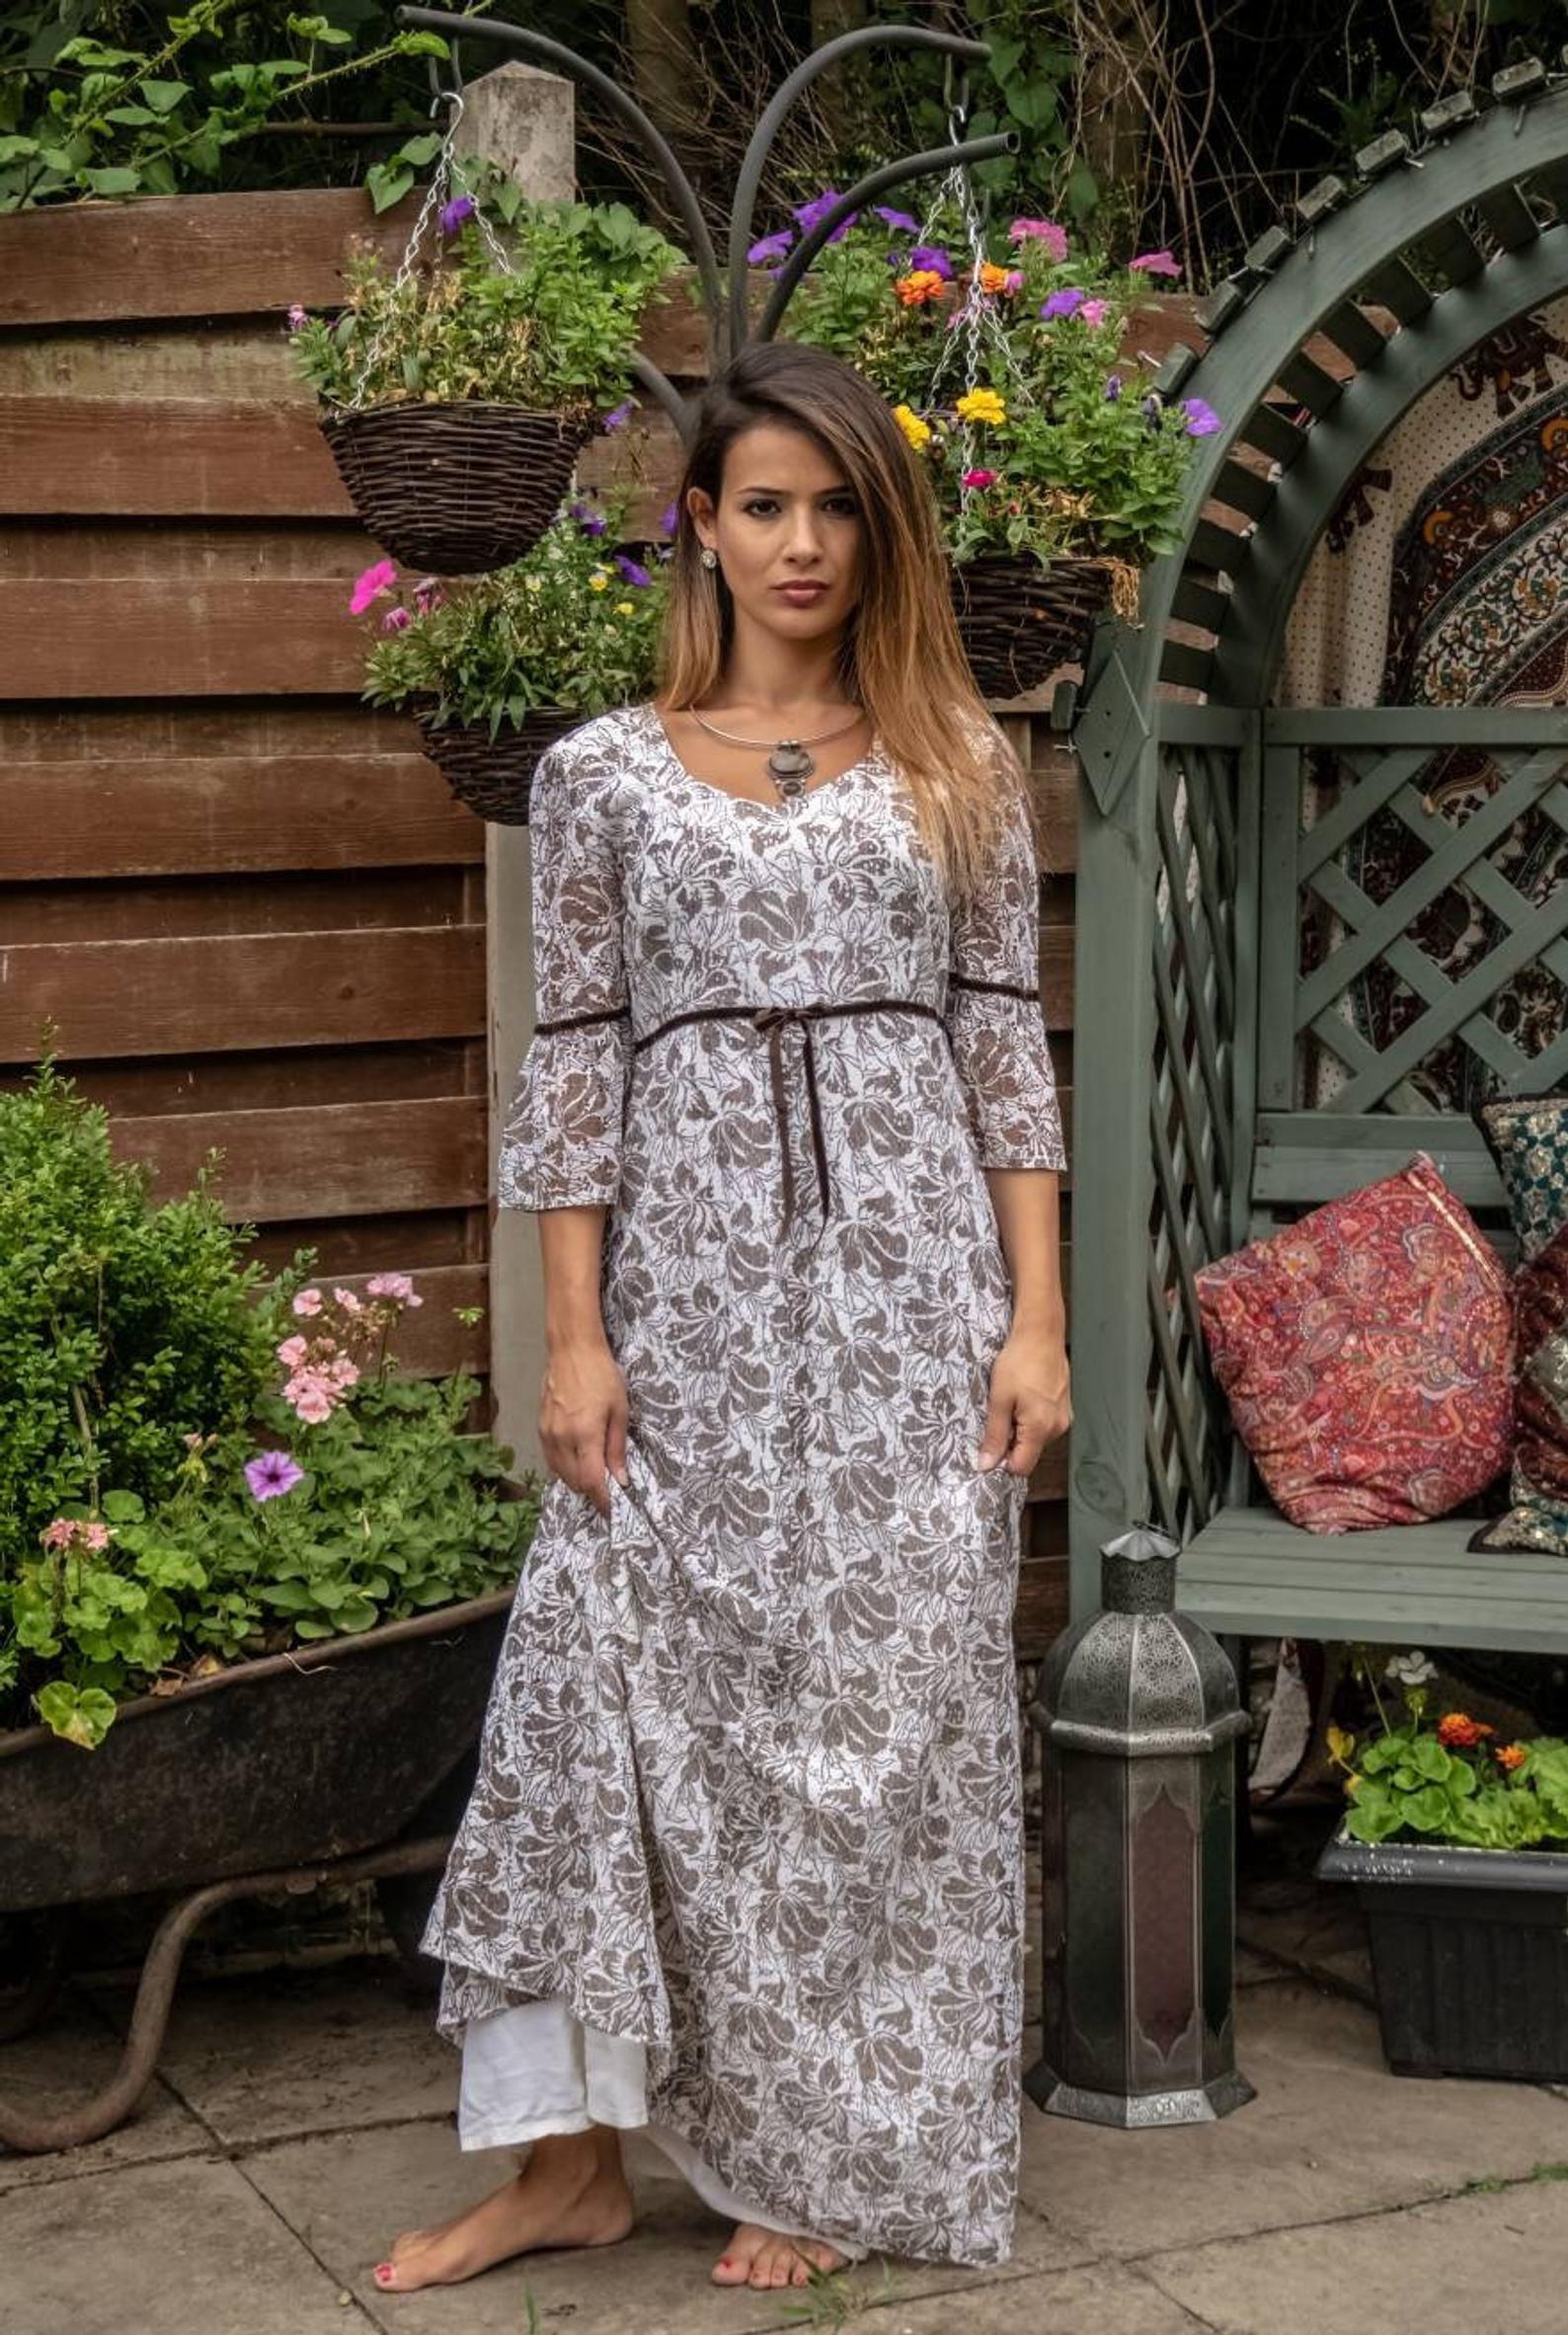 1970 S Dress Floral Dress Maxi Dress Hippie Clothes Bohemian Dress Vintage Maxi Dress Retro Dress Maxi Dress Vintage Maxi Dress Dresses [ 2365 x 1588 Pixel ]